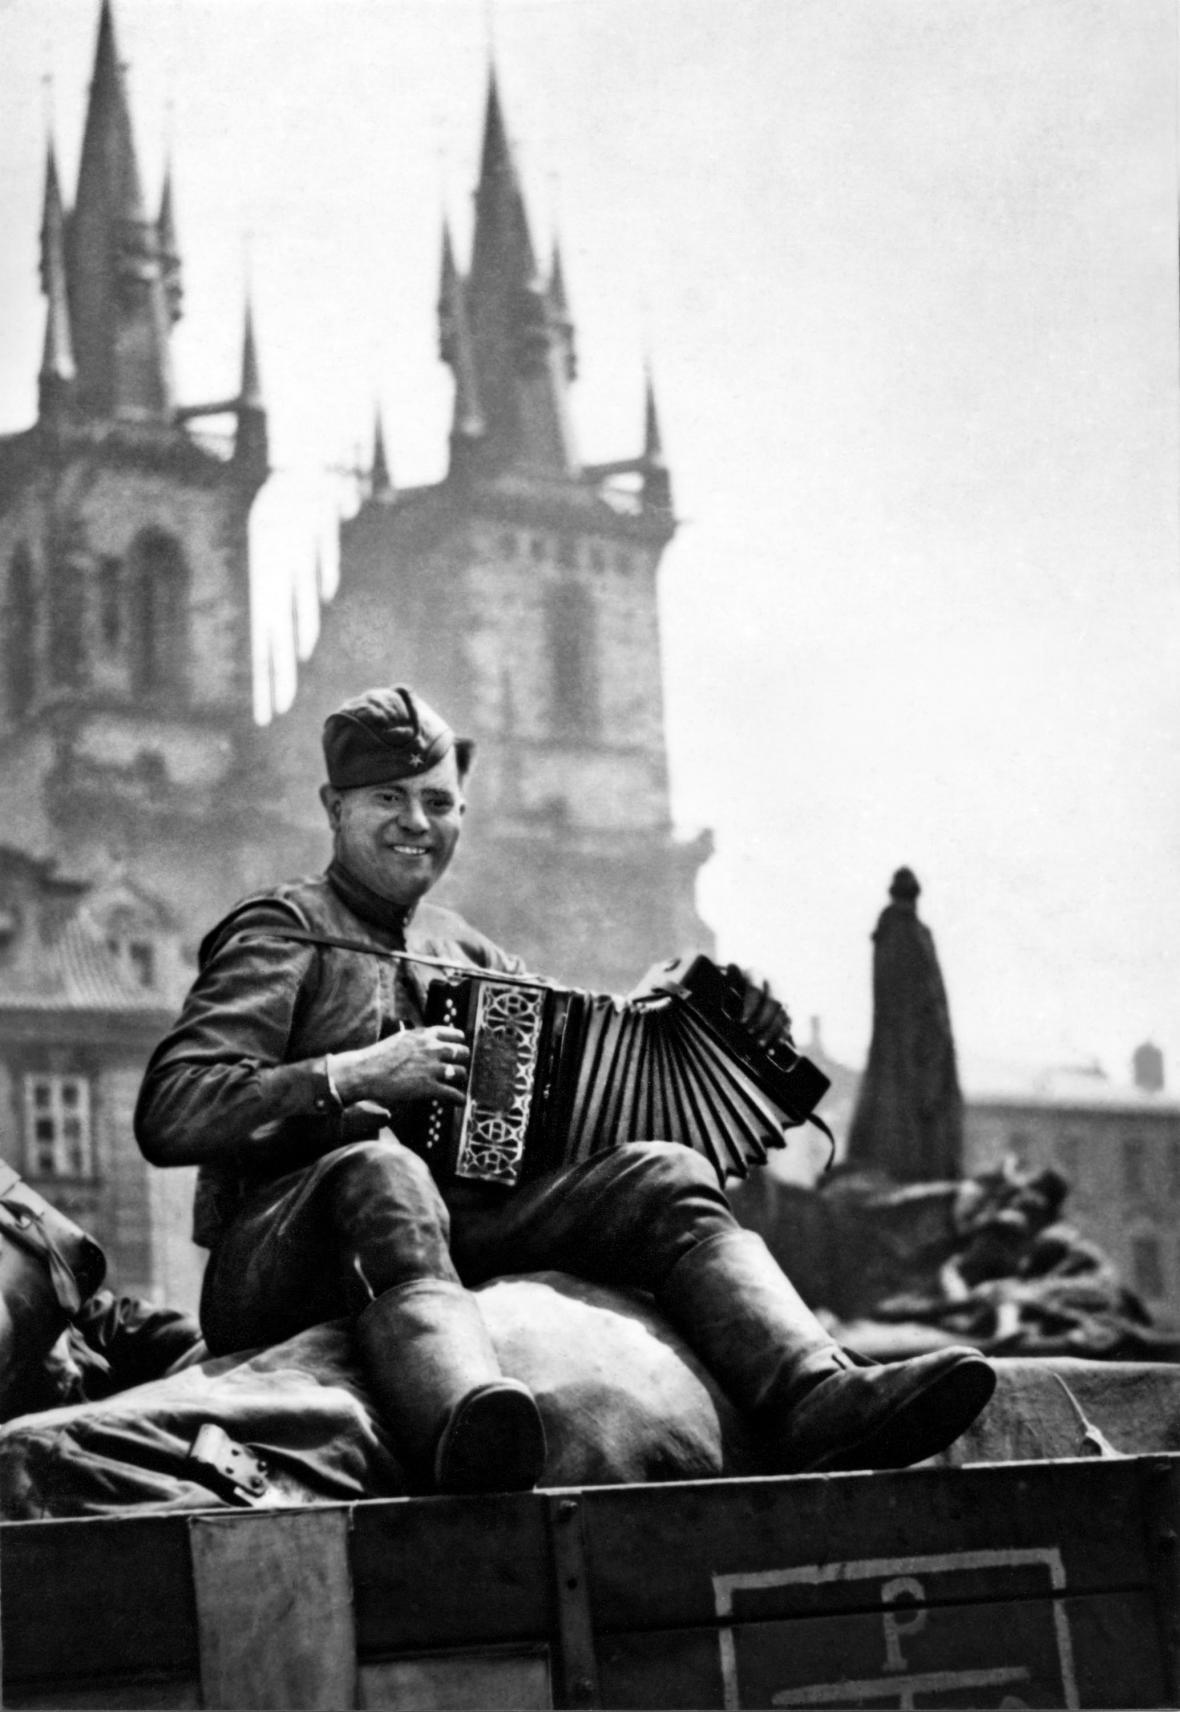 Fotografie Tibora Hontyho z roku 1945